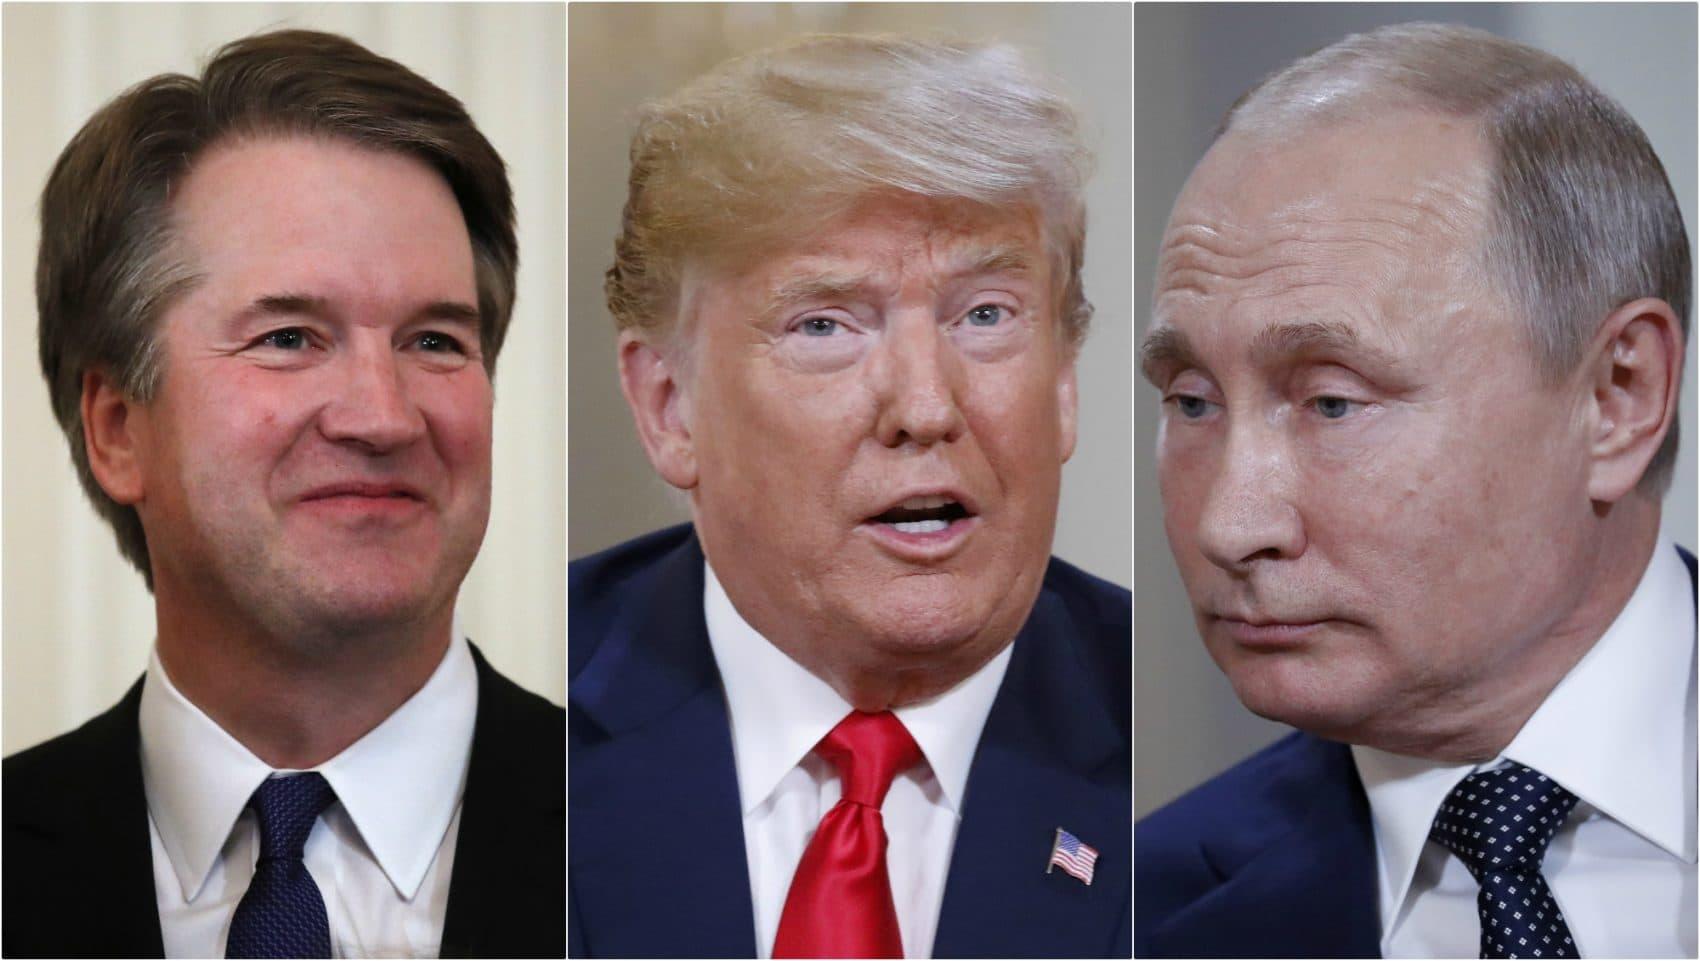 Brett Kavanaugh, Donald Trump and Vladimir Putin, all pictured in July 2018. (AP)